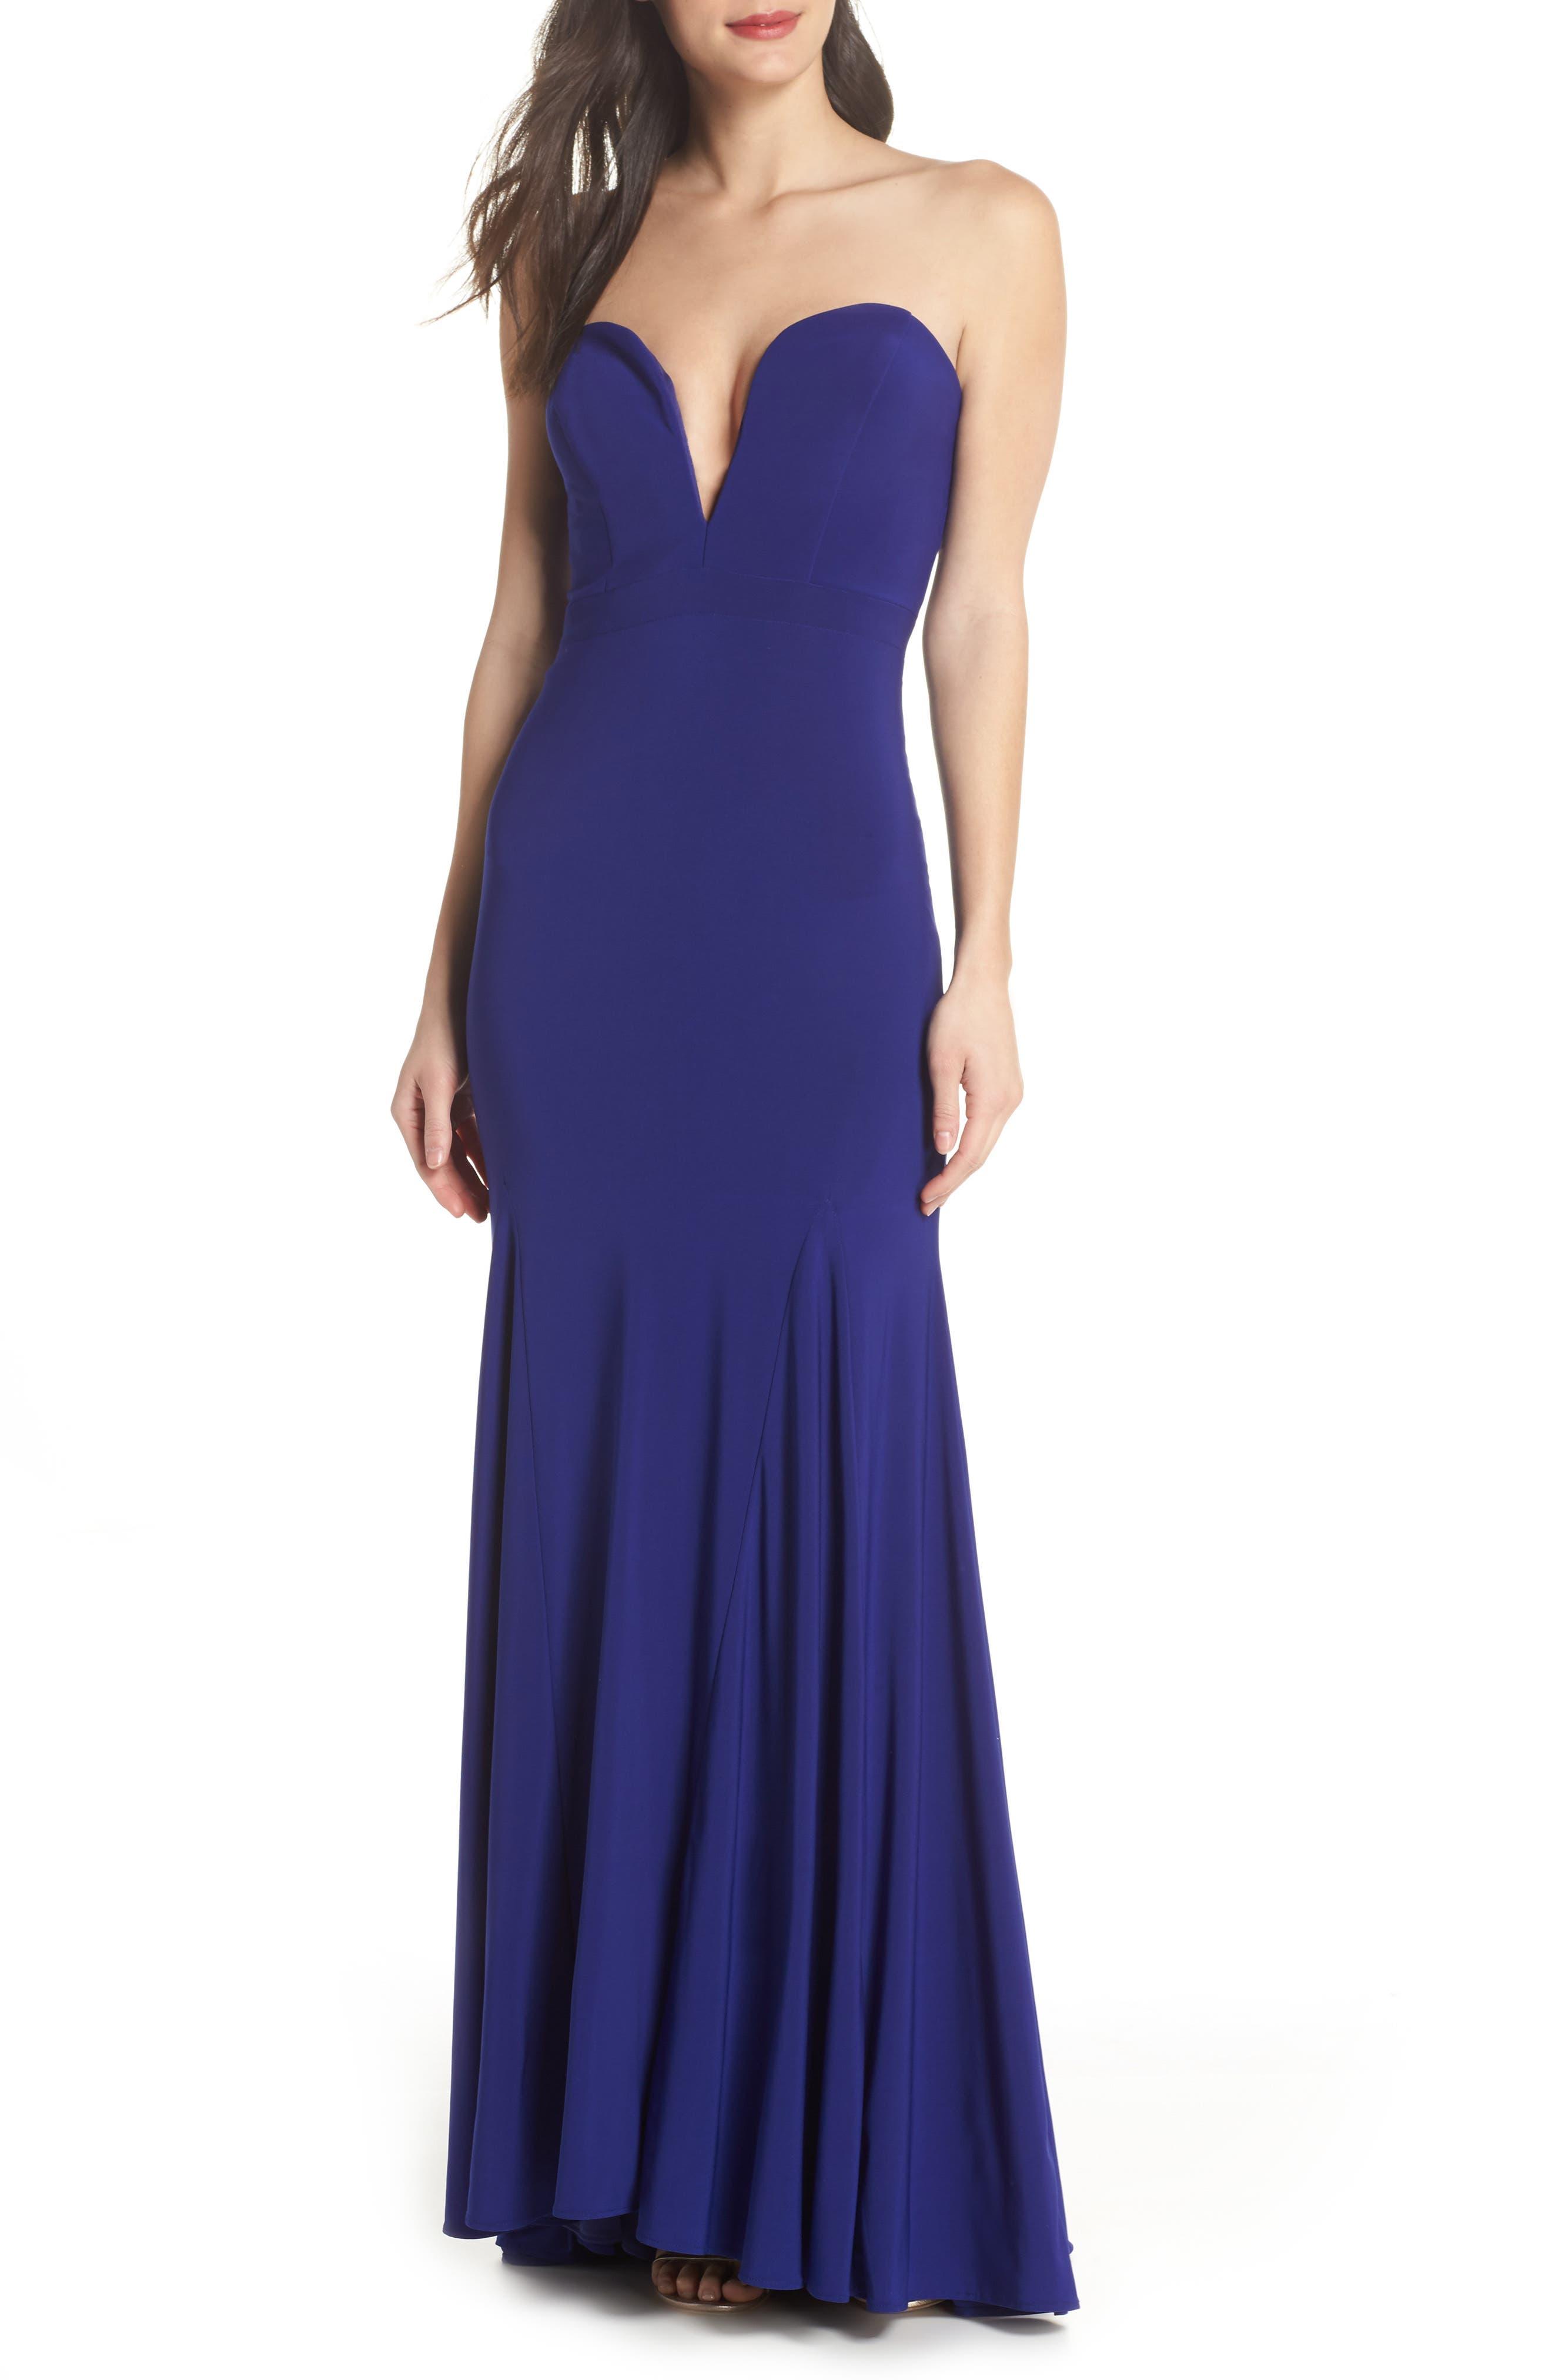 Xscape Bustier Strapless Gown